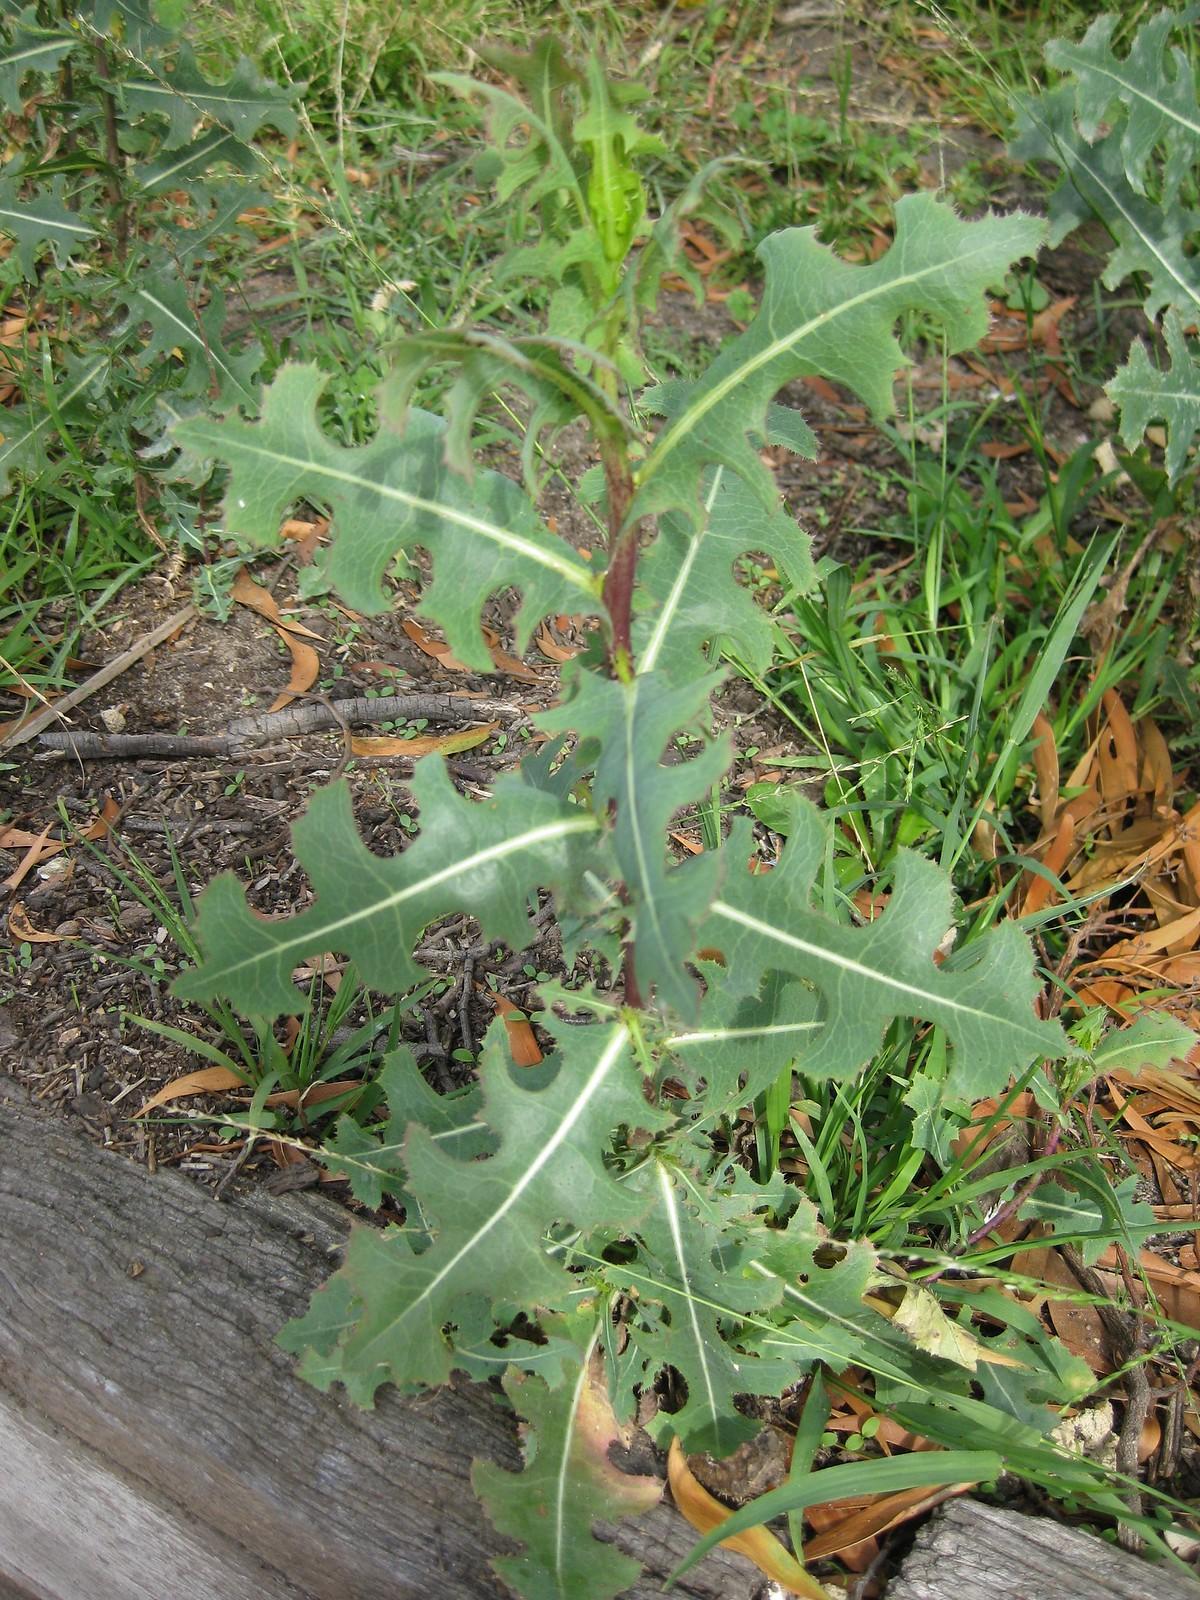 wild lettuce (Lactuca serriola) too old to eat